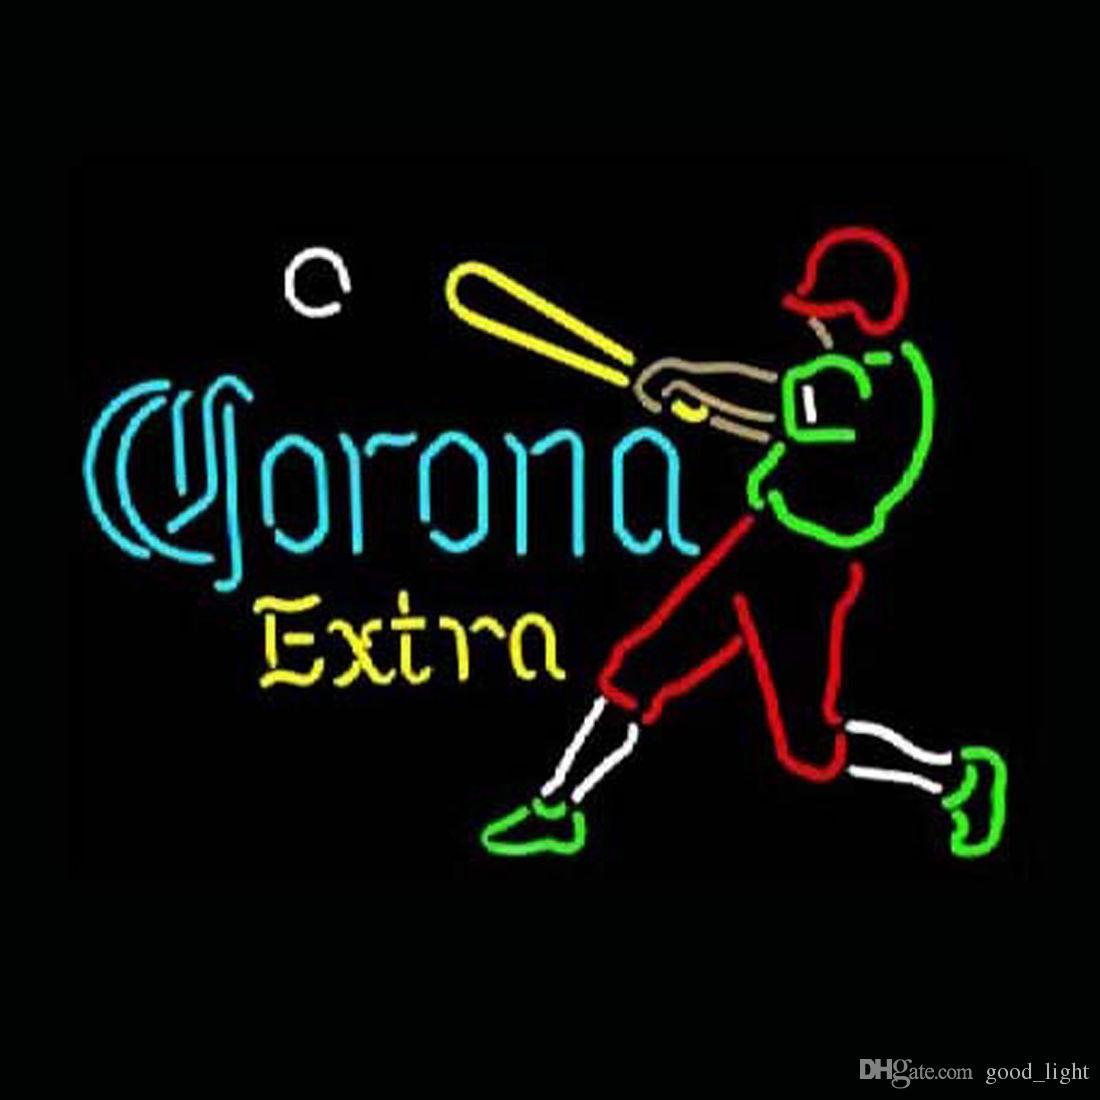 "17""x14"" Corona Extra Beer Neon Light Sign Beer Bar Pub Club Store Shop Display"